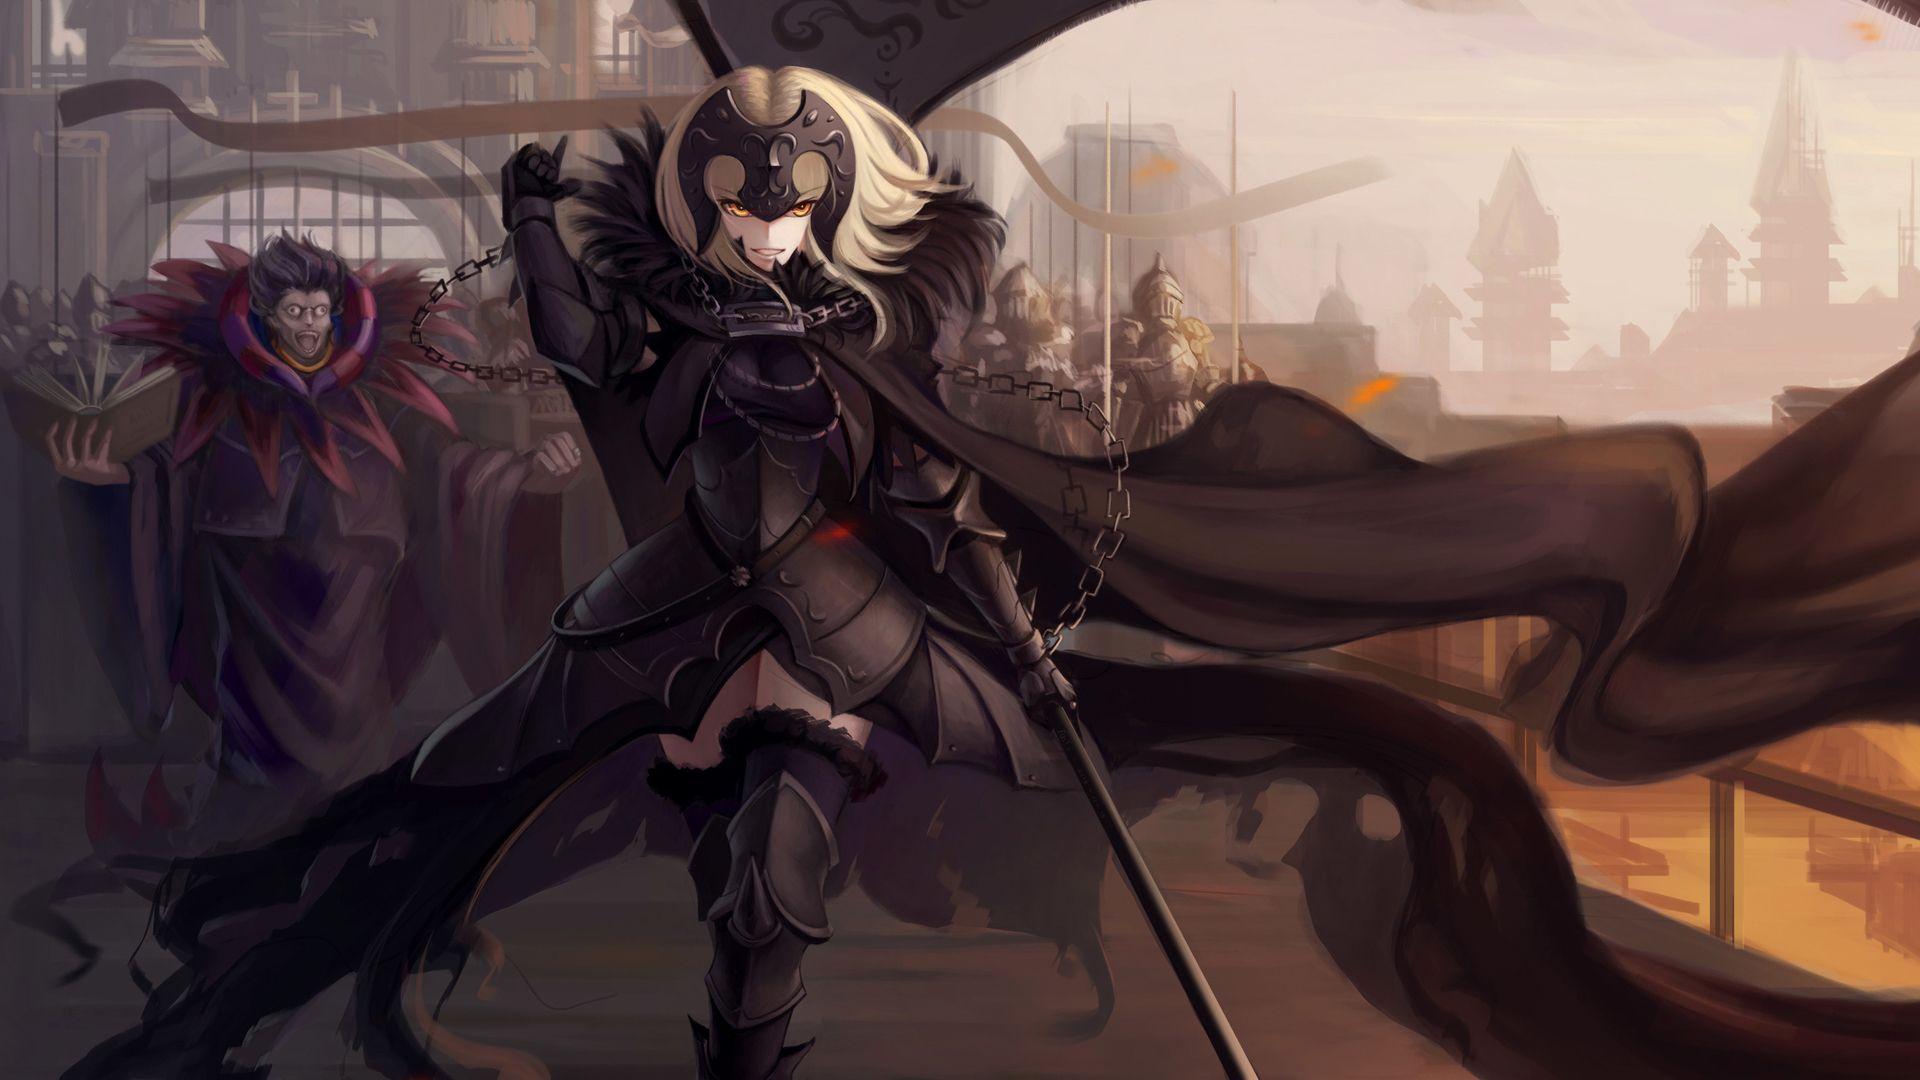 Alter Jeanne D Arc Caster Fate Apocrypha Wallpaper Papel